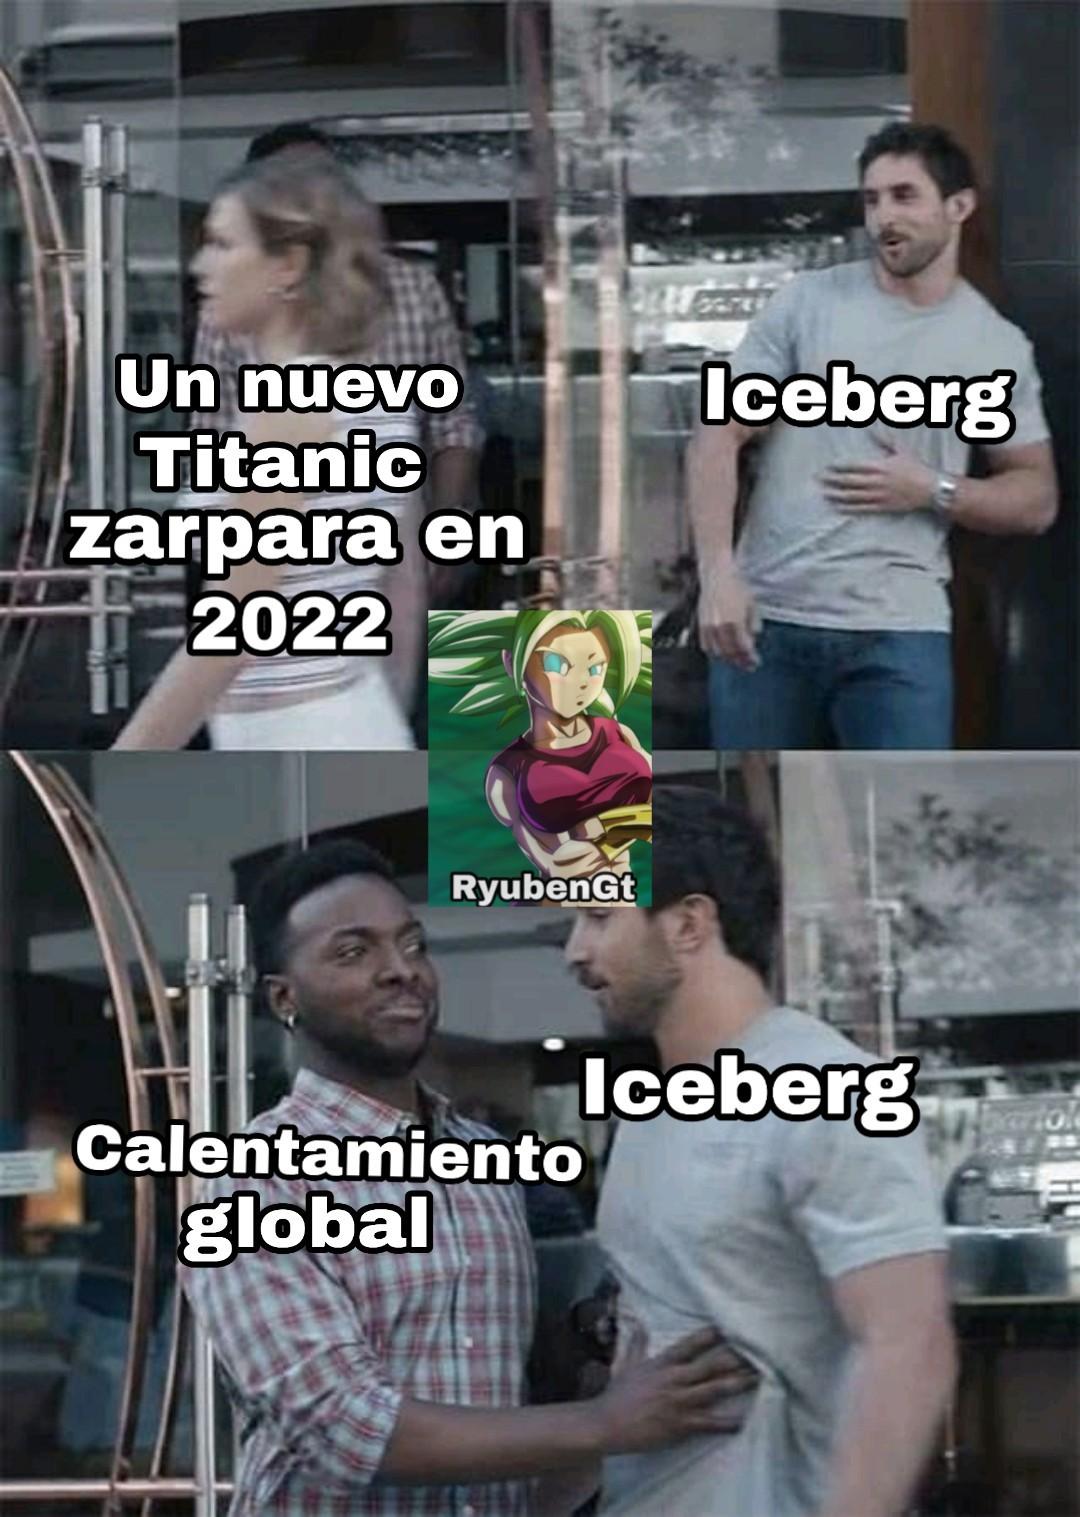 Iceberg matar Titanic calentamiento matar Iceberg - meme